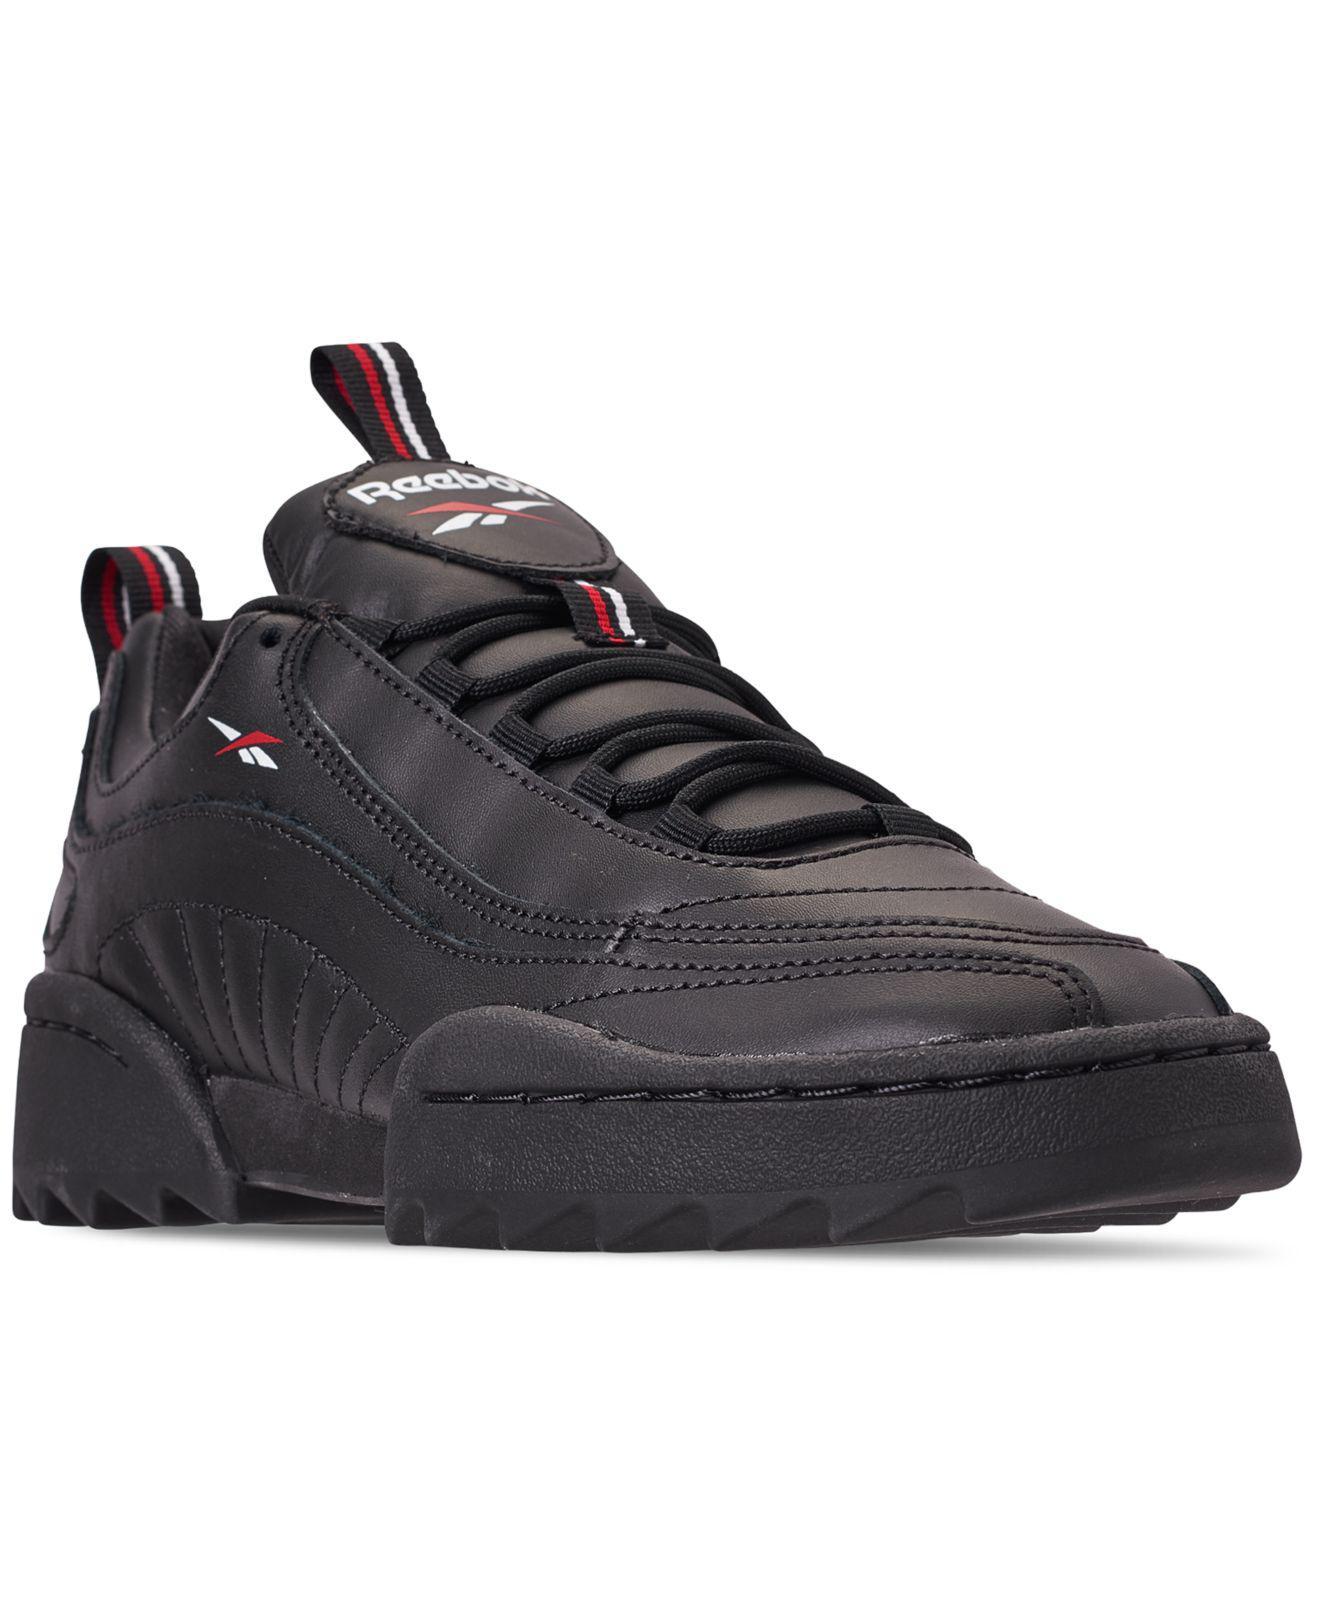 Lyst - Reebok Classics Rivyx Ripple Casual Sneakers From Finish Line ... 1ec628c08